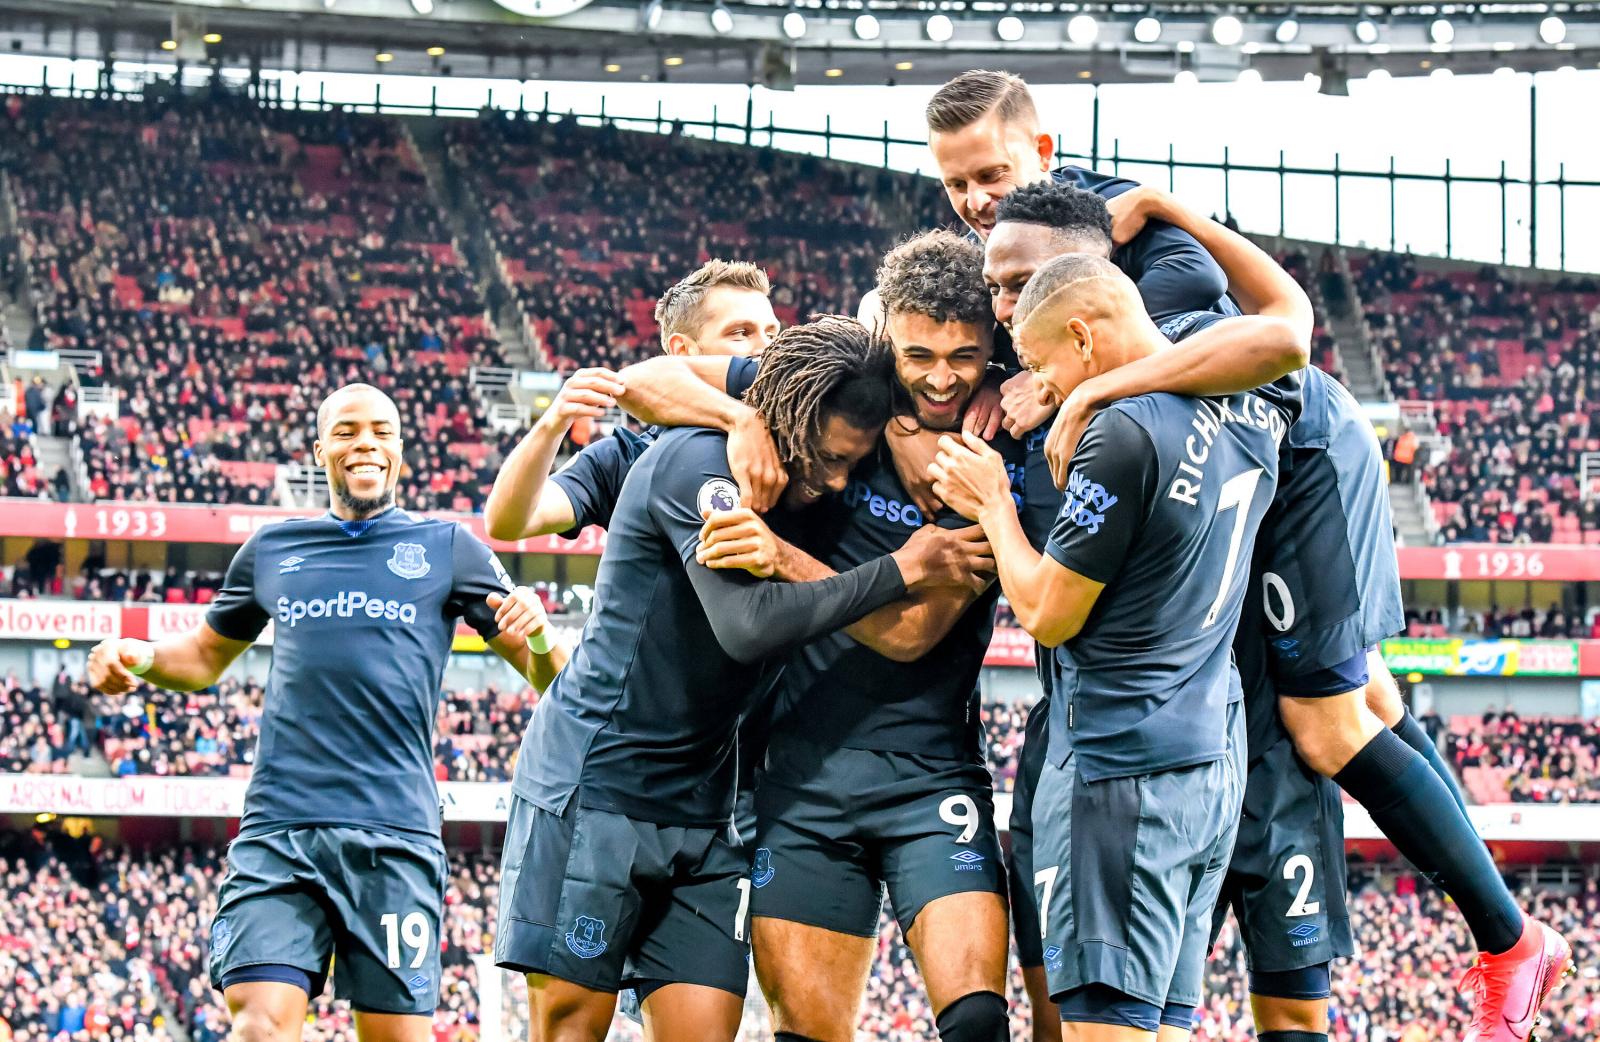 «Эвертон» - «Саутгемптон»: прогноз на матч чемпионата Англии